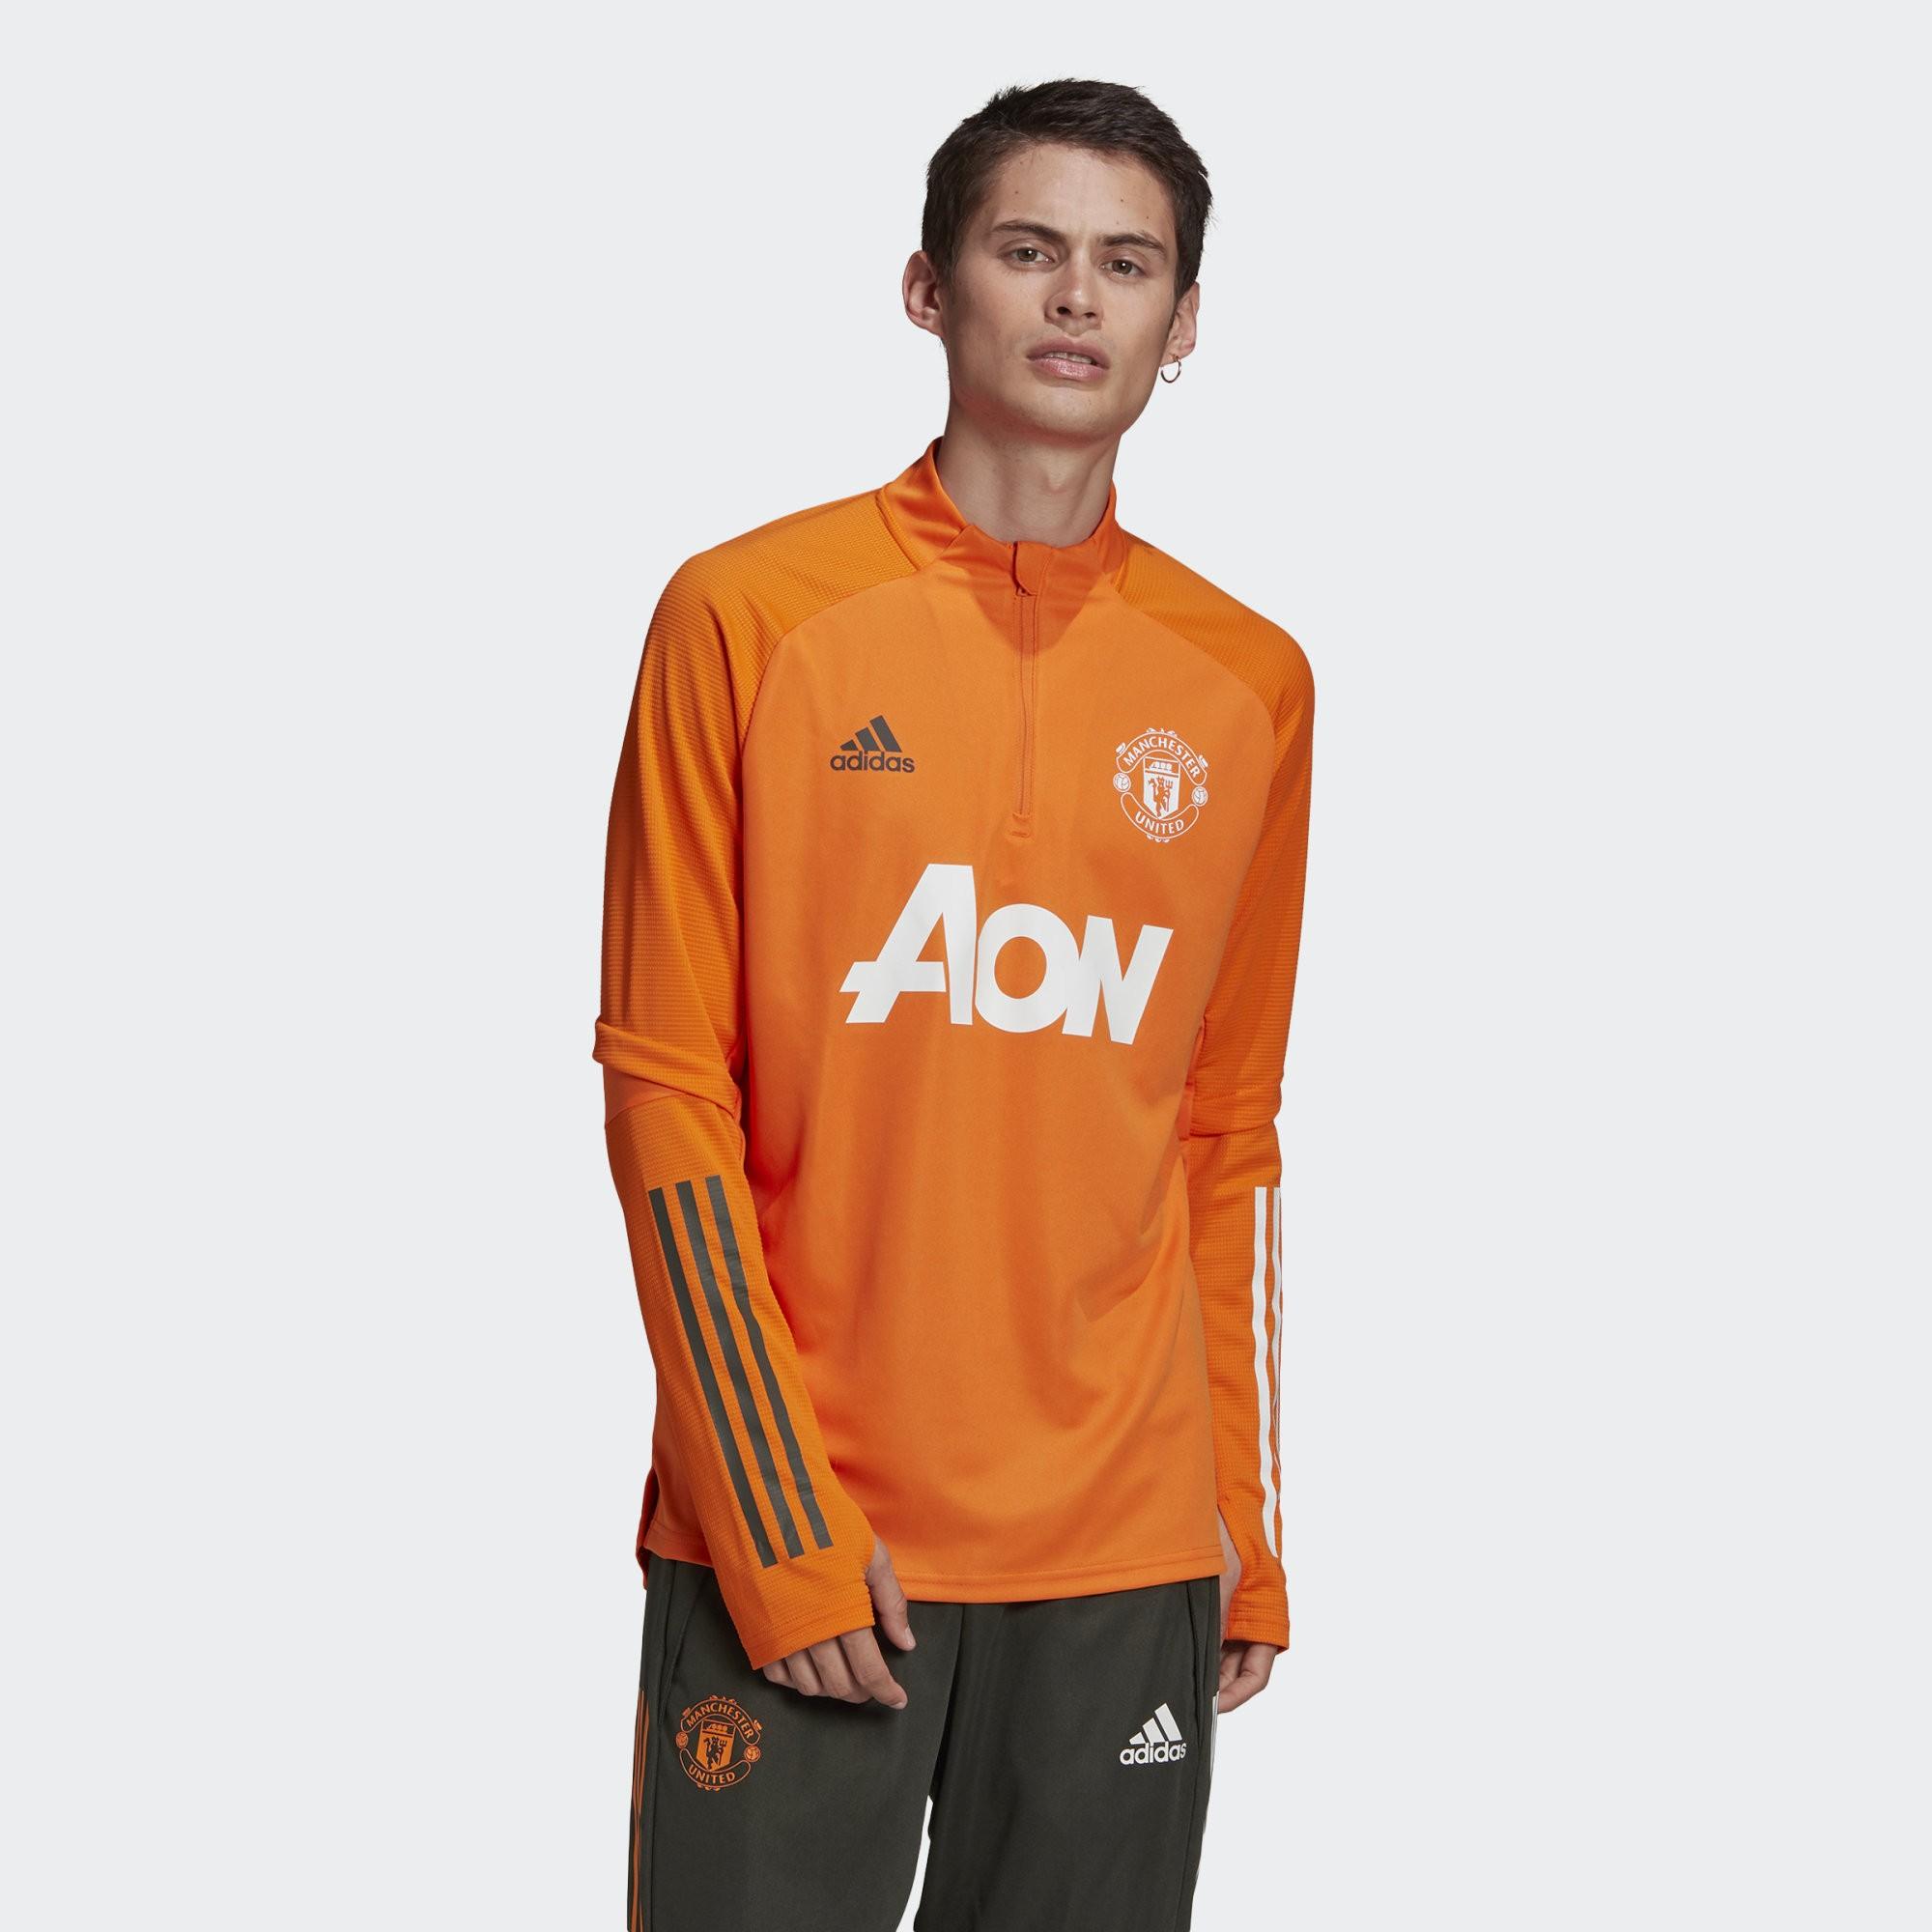 Manchester United MUFC Adidas Felpa Allenamento Training Sweatshirt Arancione 0